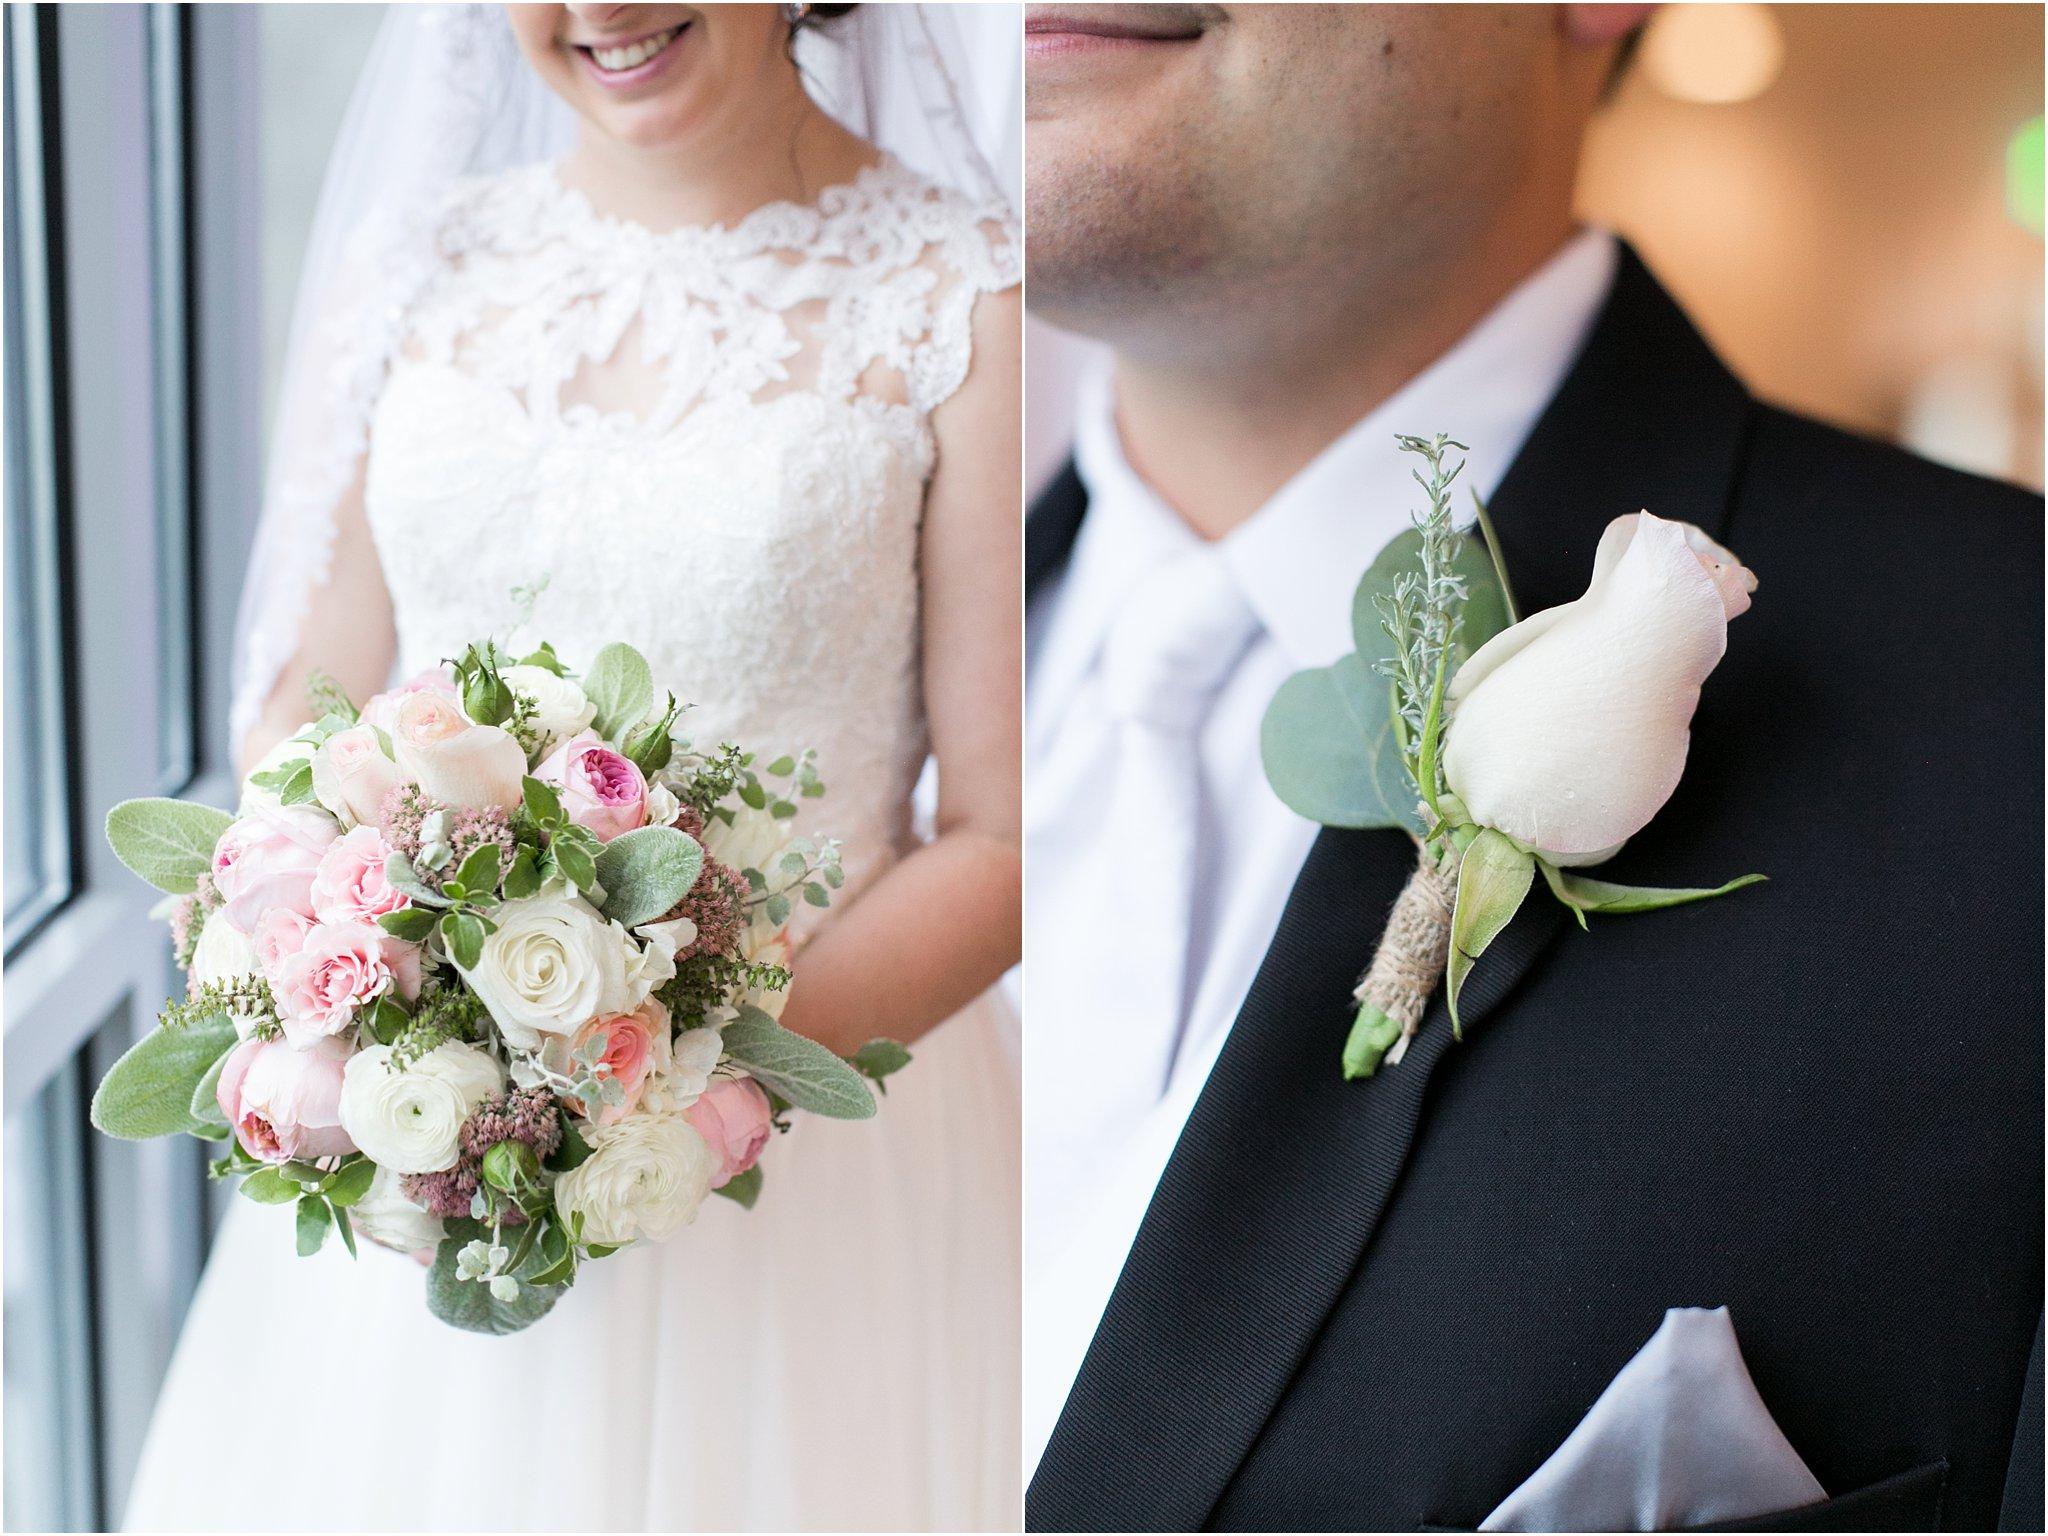 jessica_ryan_photography_virginia_wedding_photographer_wedding_hurricane_norfolk_botanical_gardens_hurricane_matthew_wedding_3573